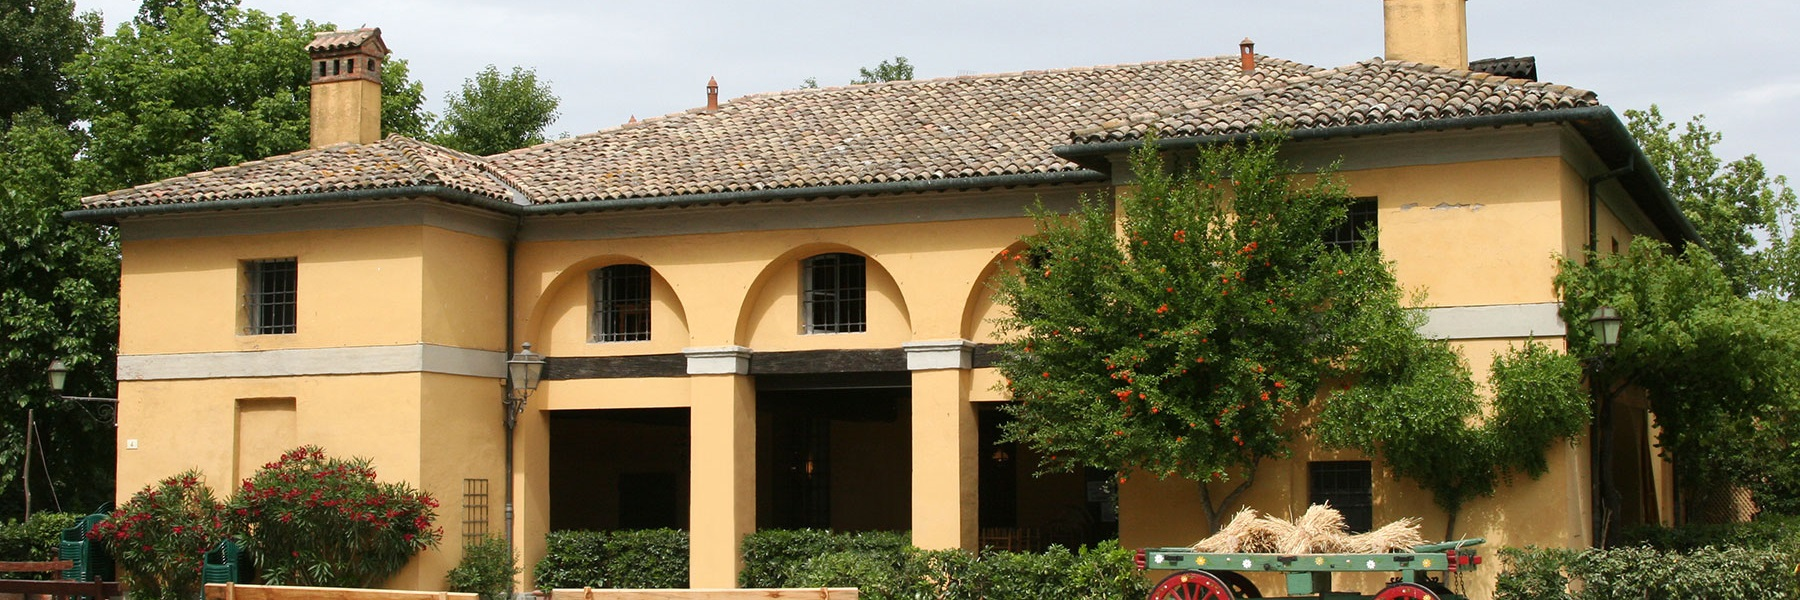 La Casa delle Aie (Hofhaus)